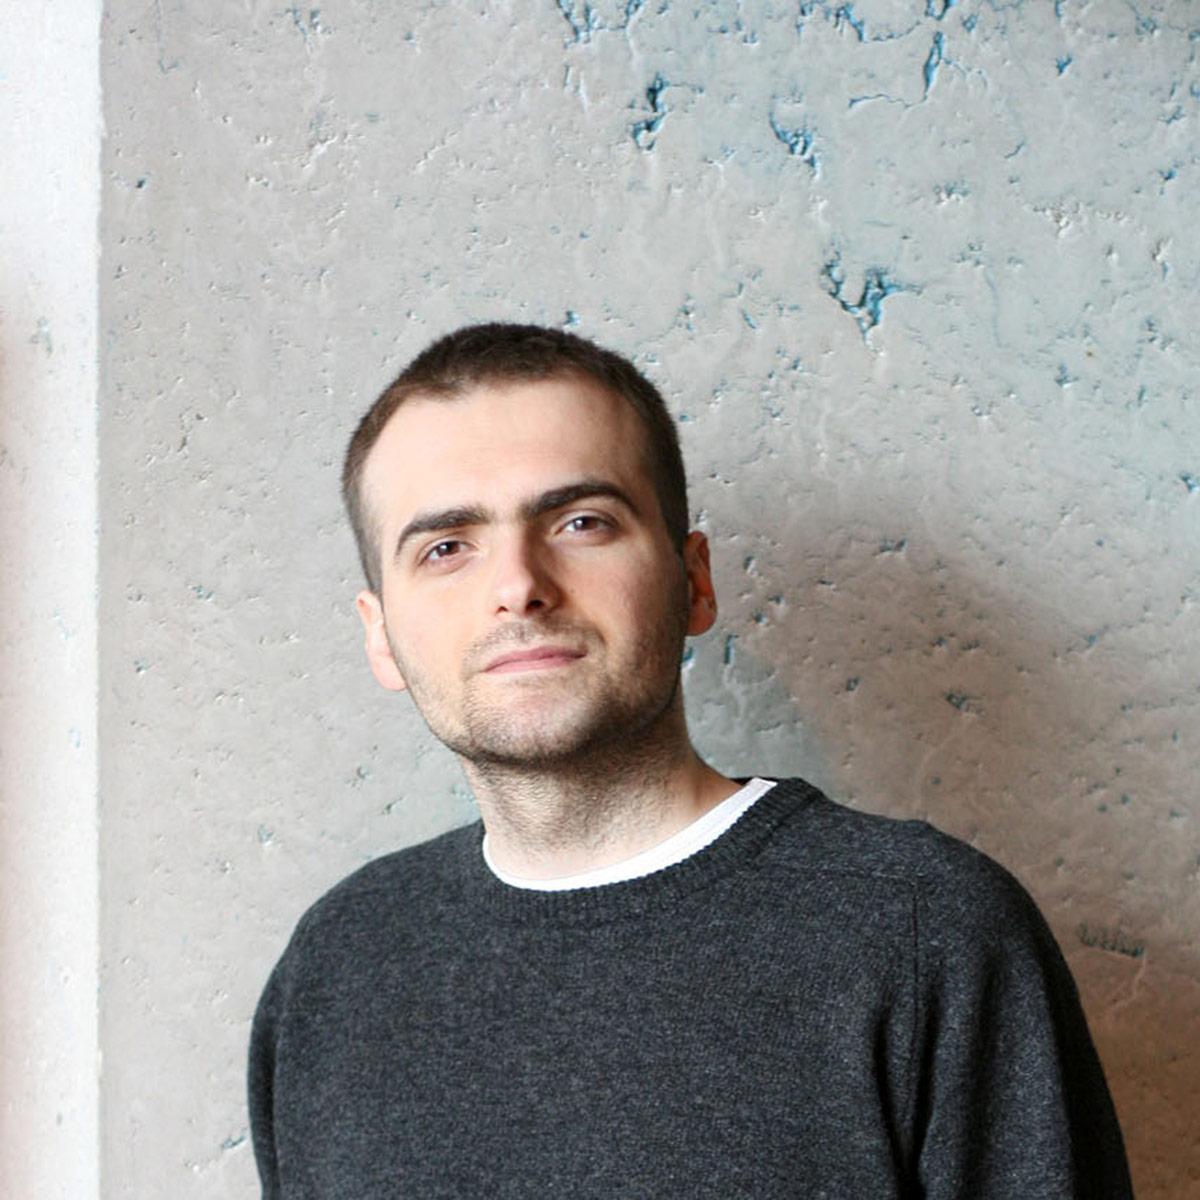 Sebastian Skoczylas